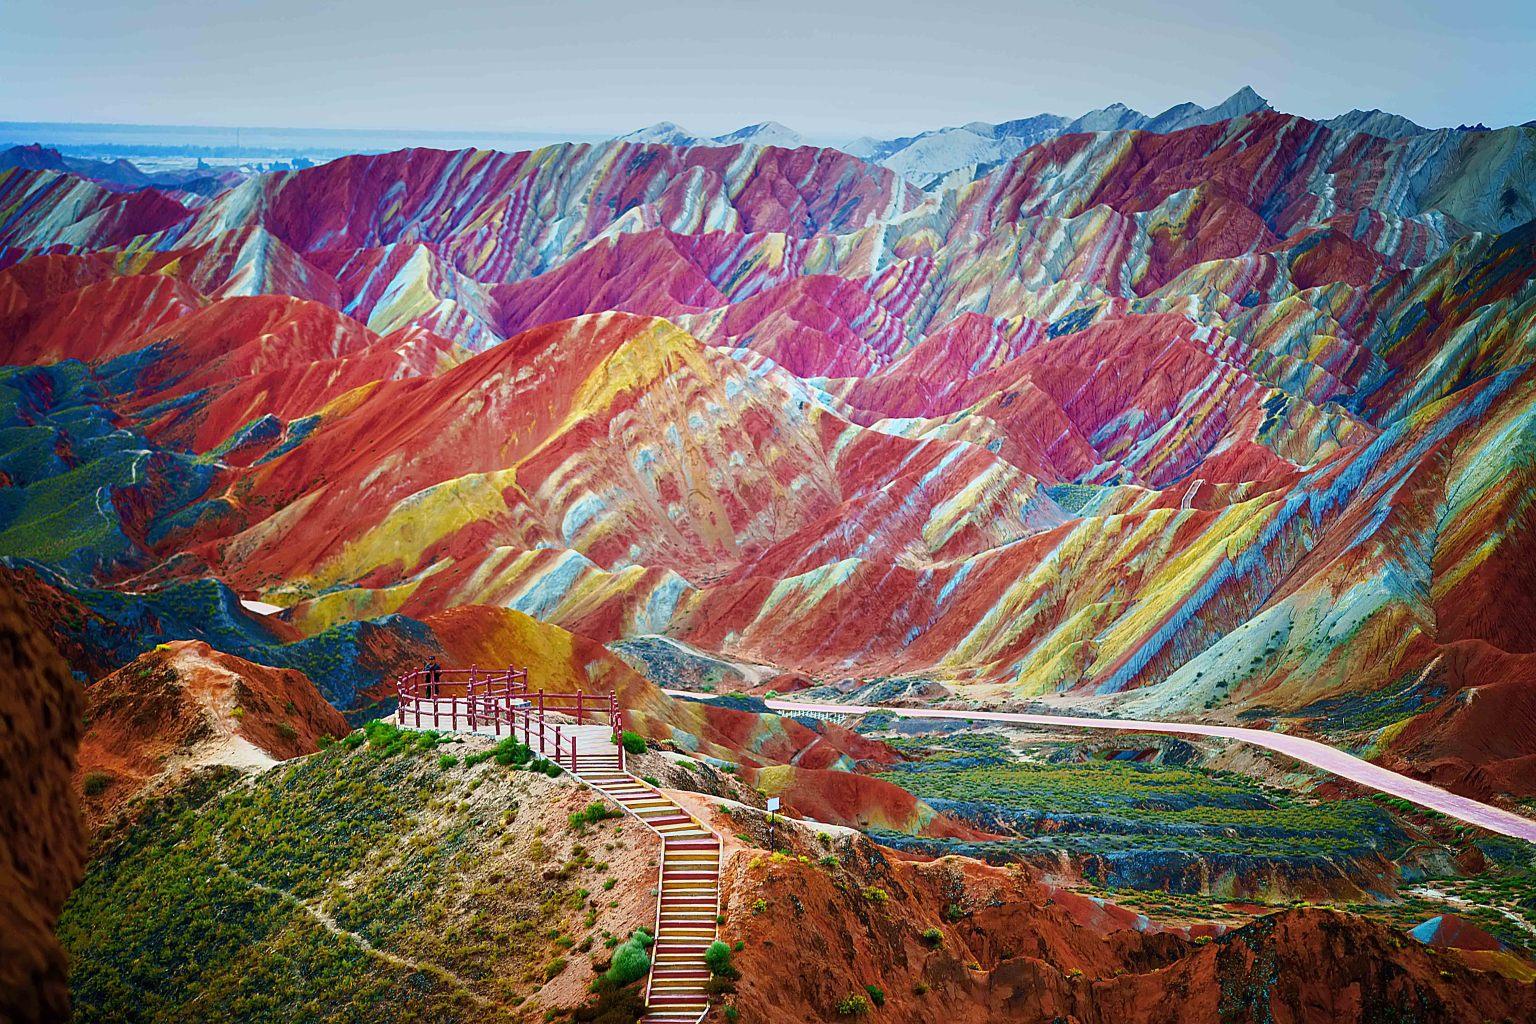 China's Danxia Landscapes